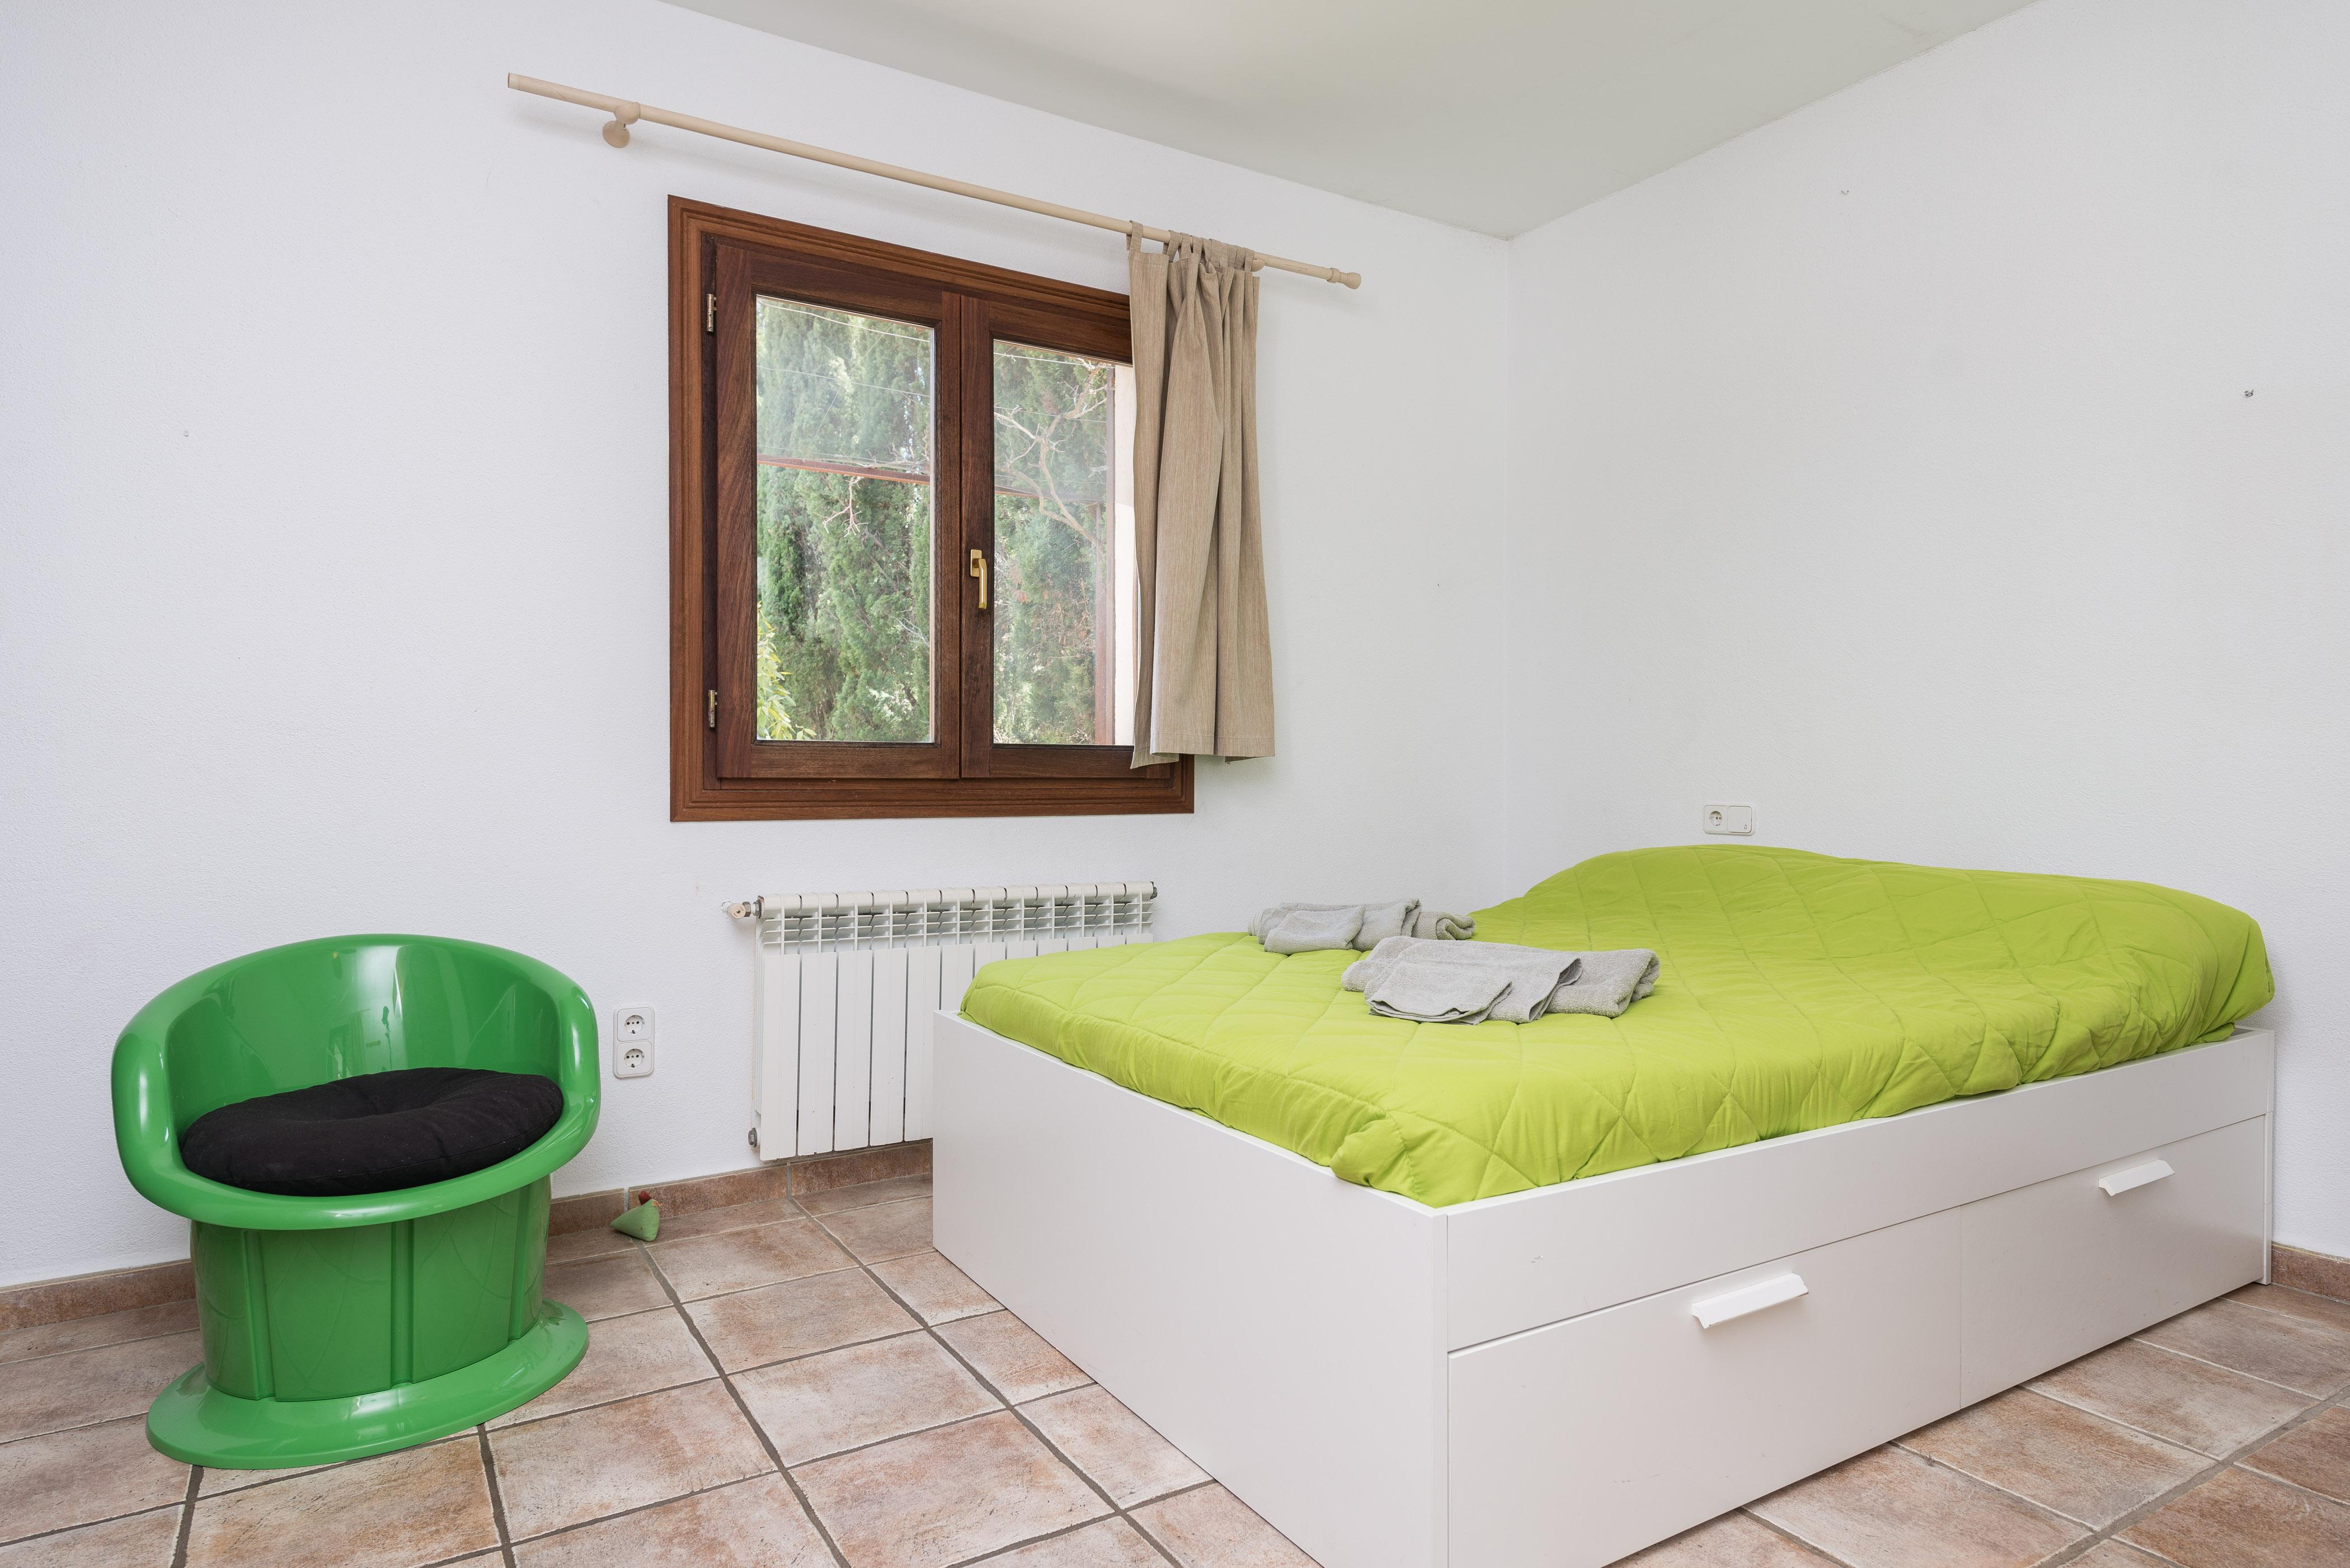 Ferienhaus SA CORBAIA (2020559), Arta, Mallorca, Balearische Inseln, Spanien, Bild 28